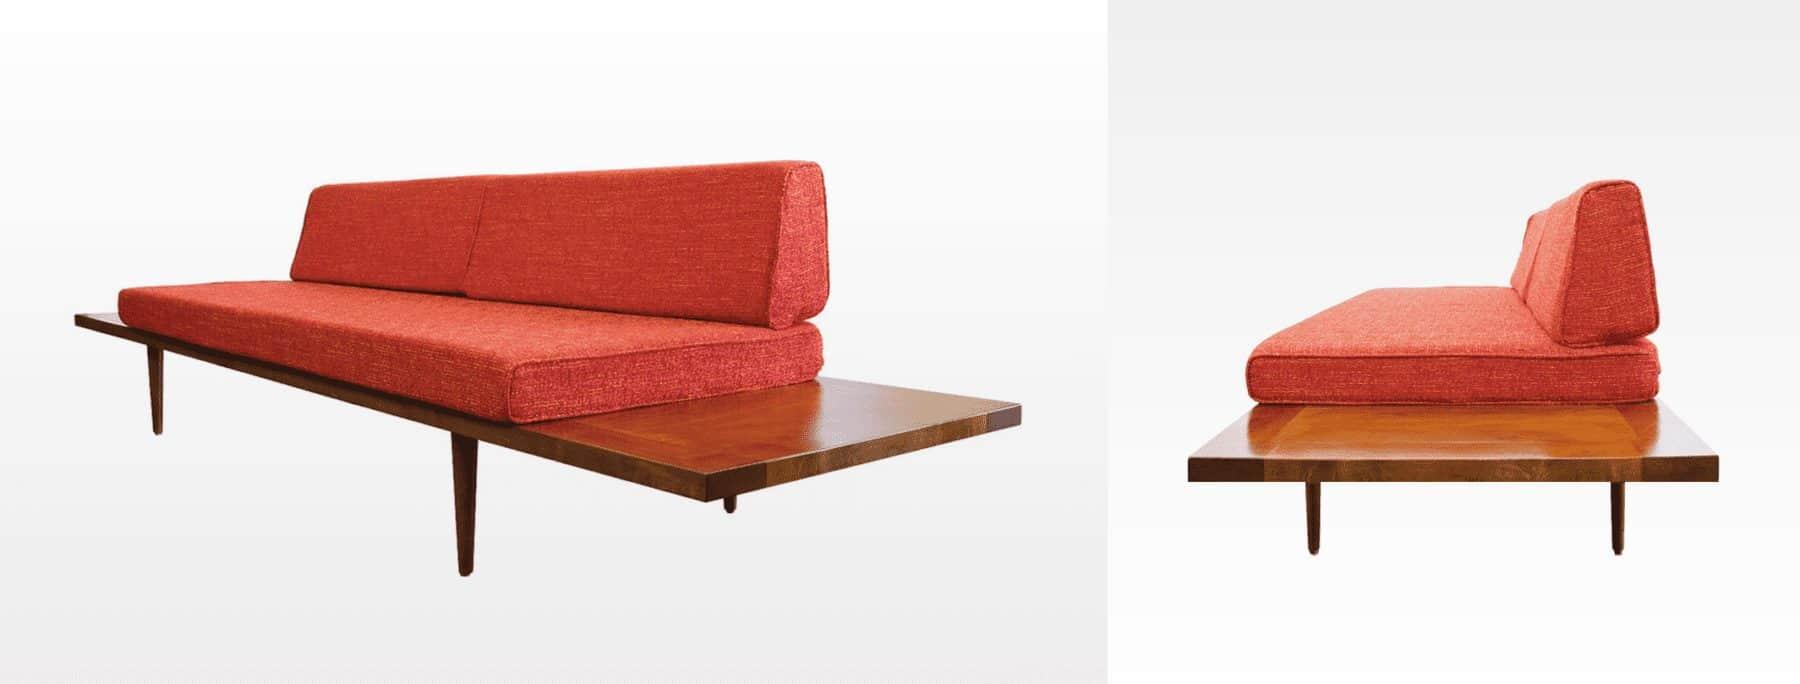 Mid Century Modern Sofa - mad men style sofa